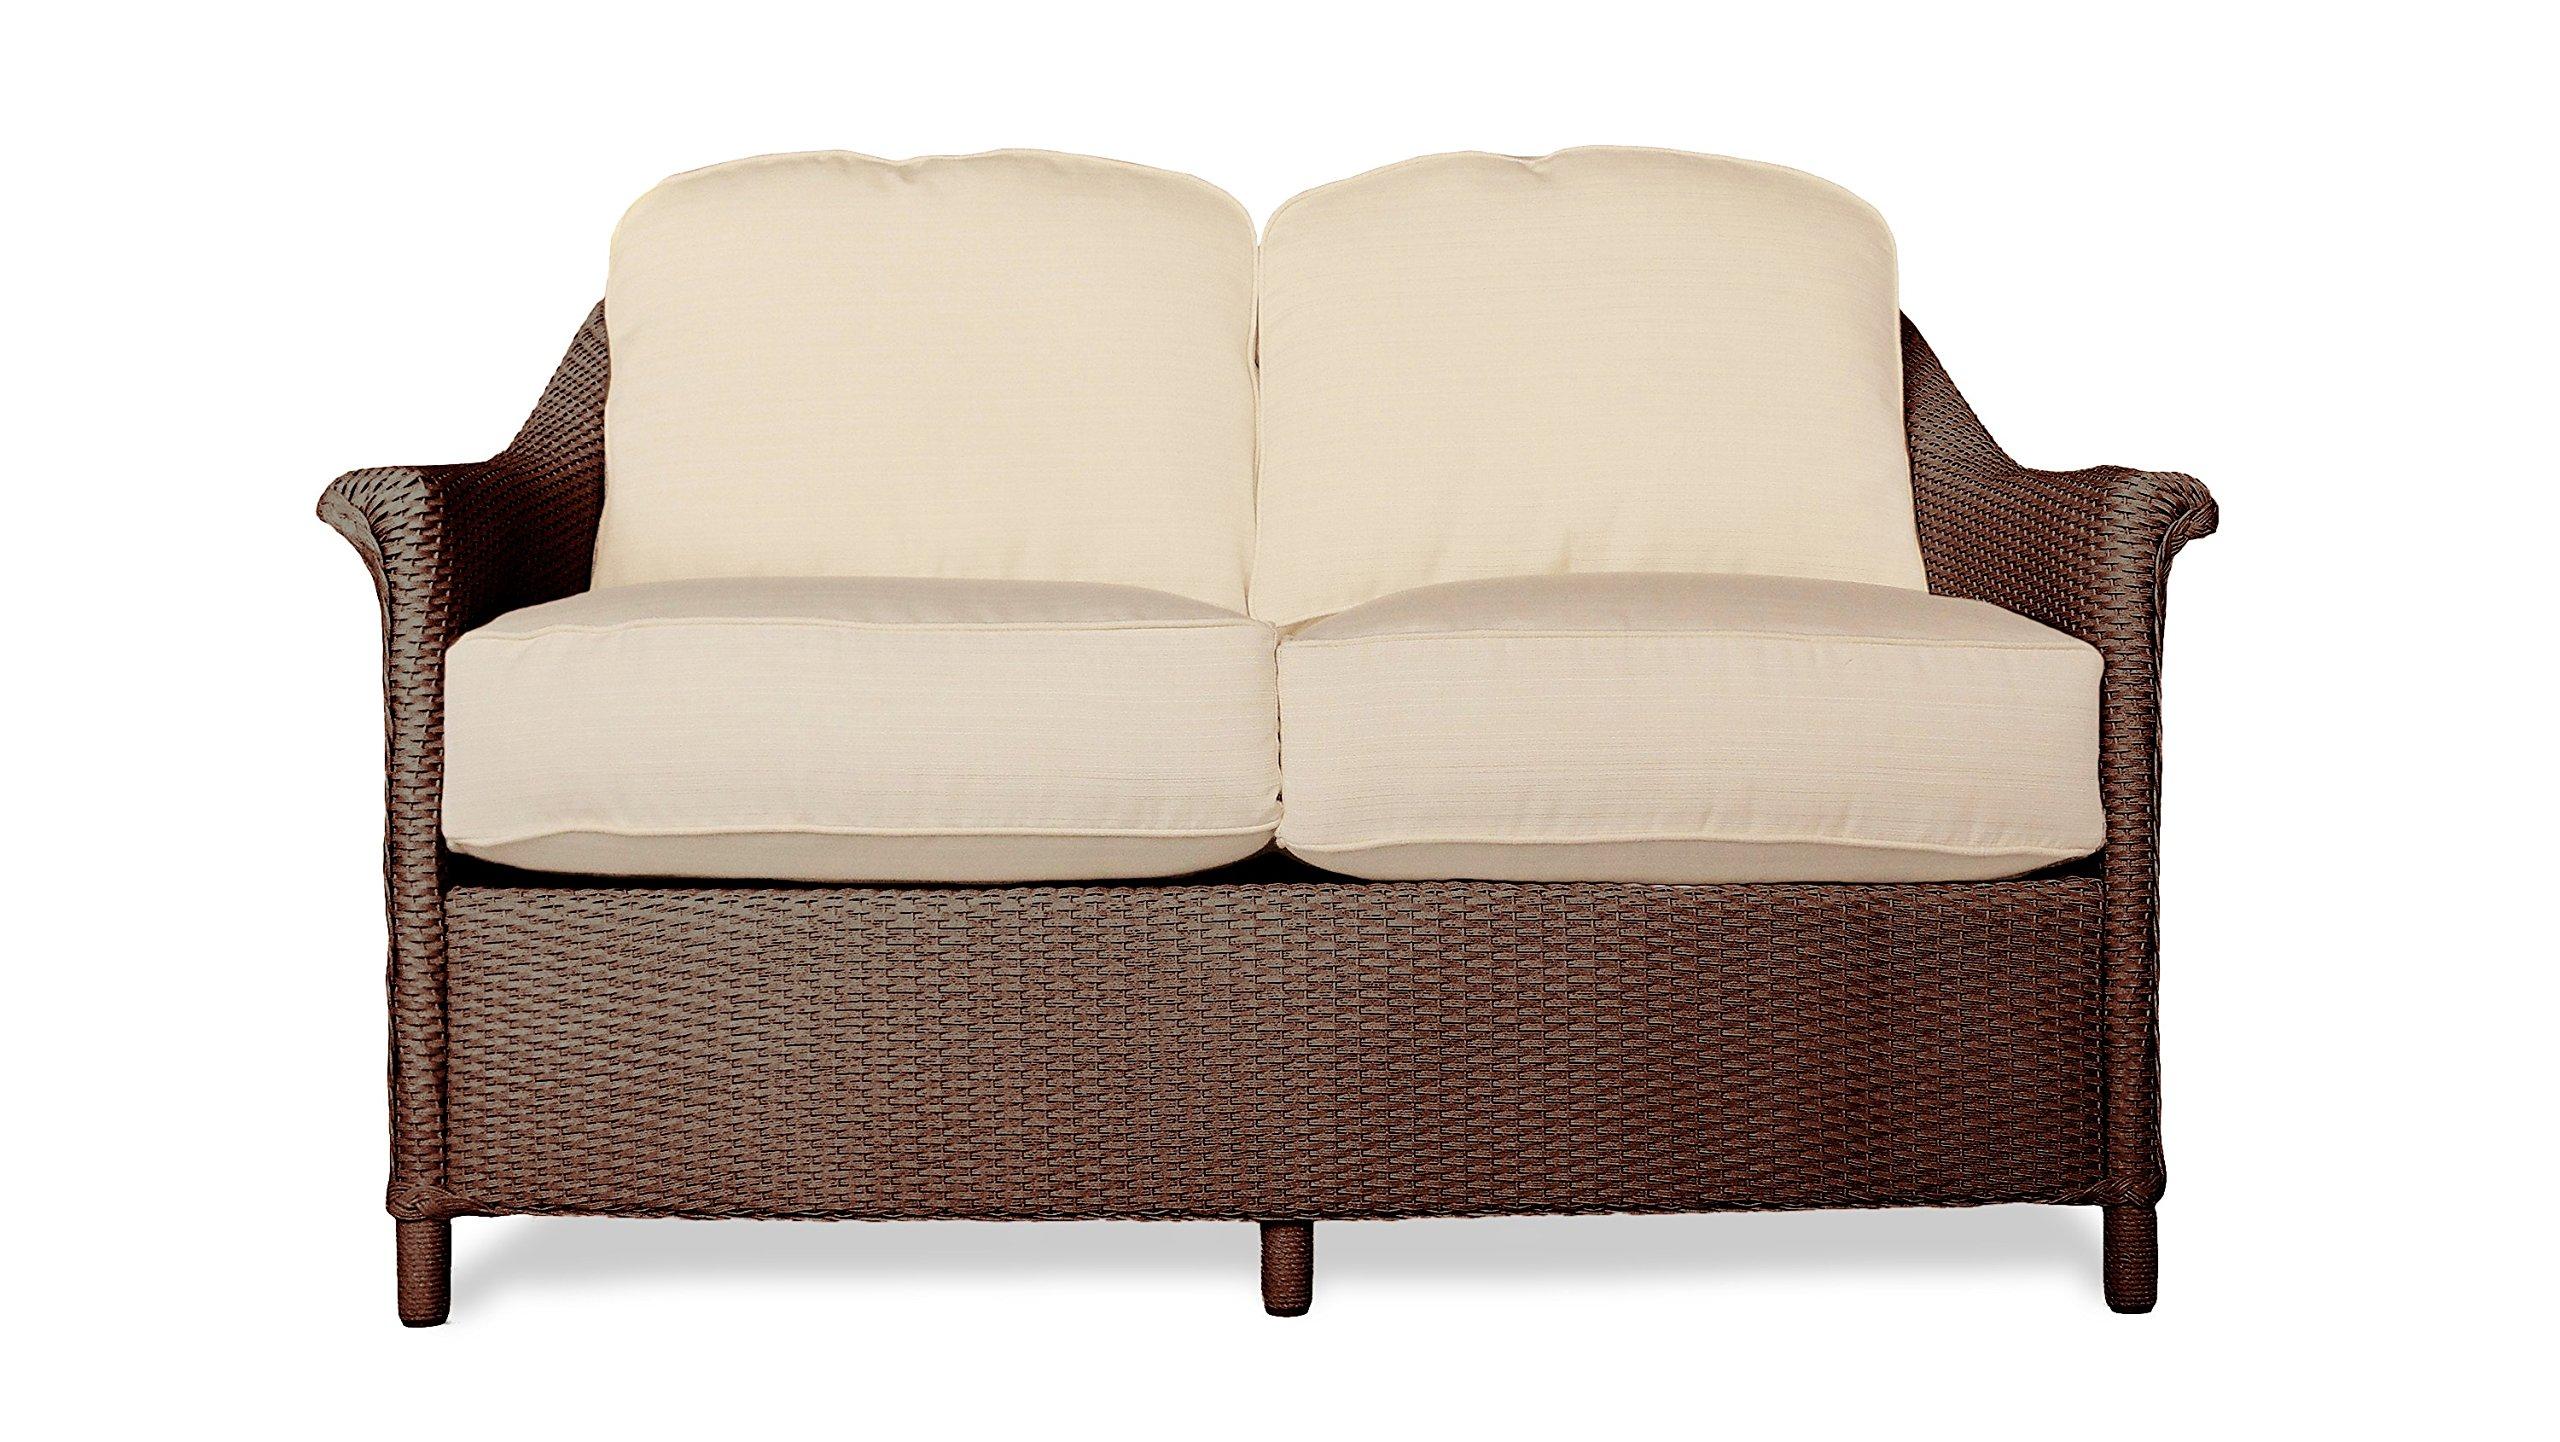 Lloyd Flanders Dining Chair Chair Pads Amp Cushions